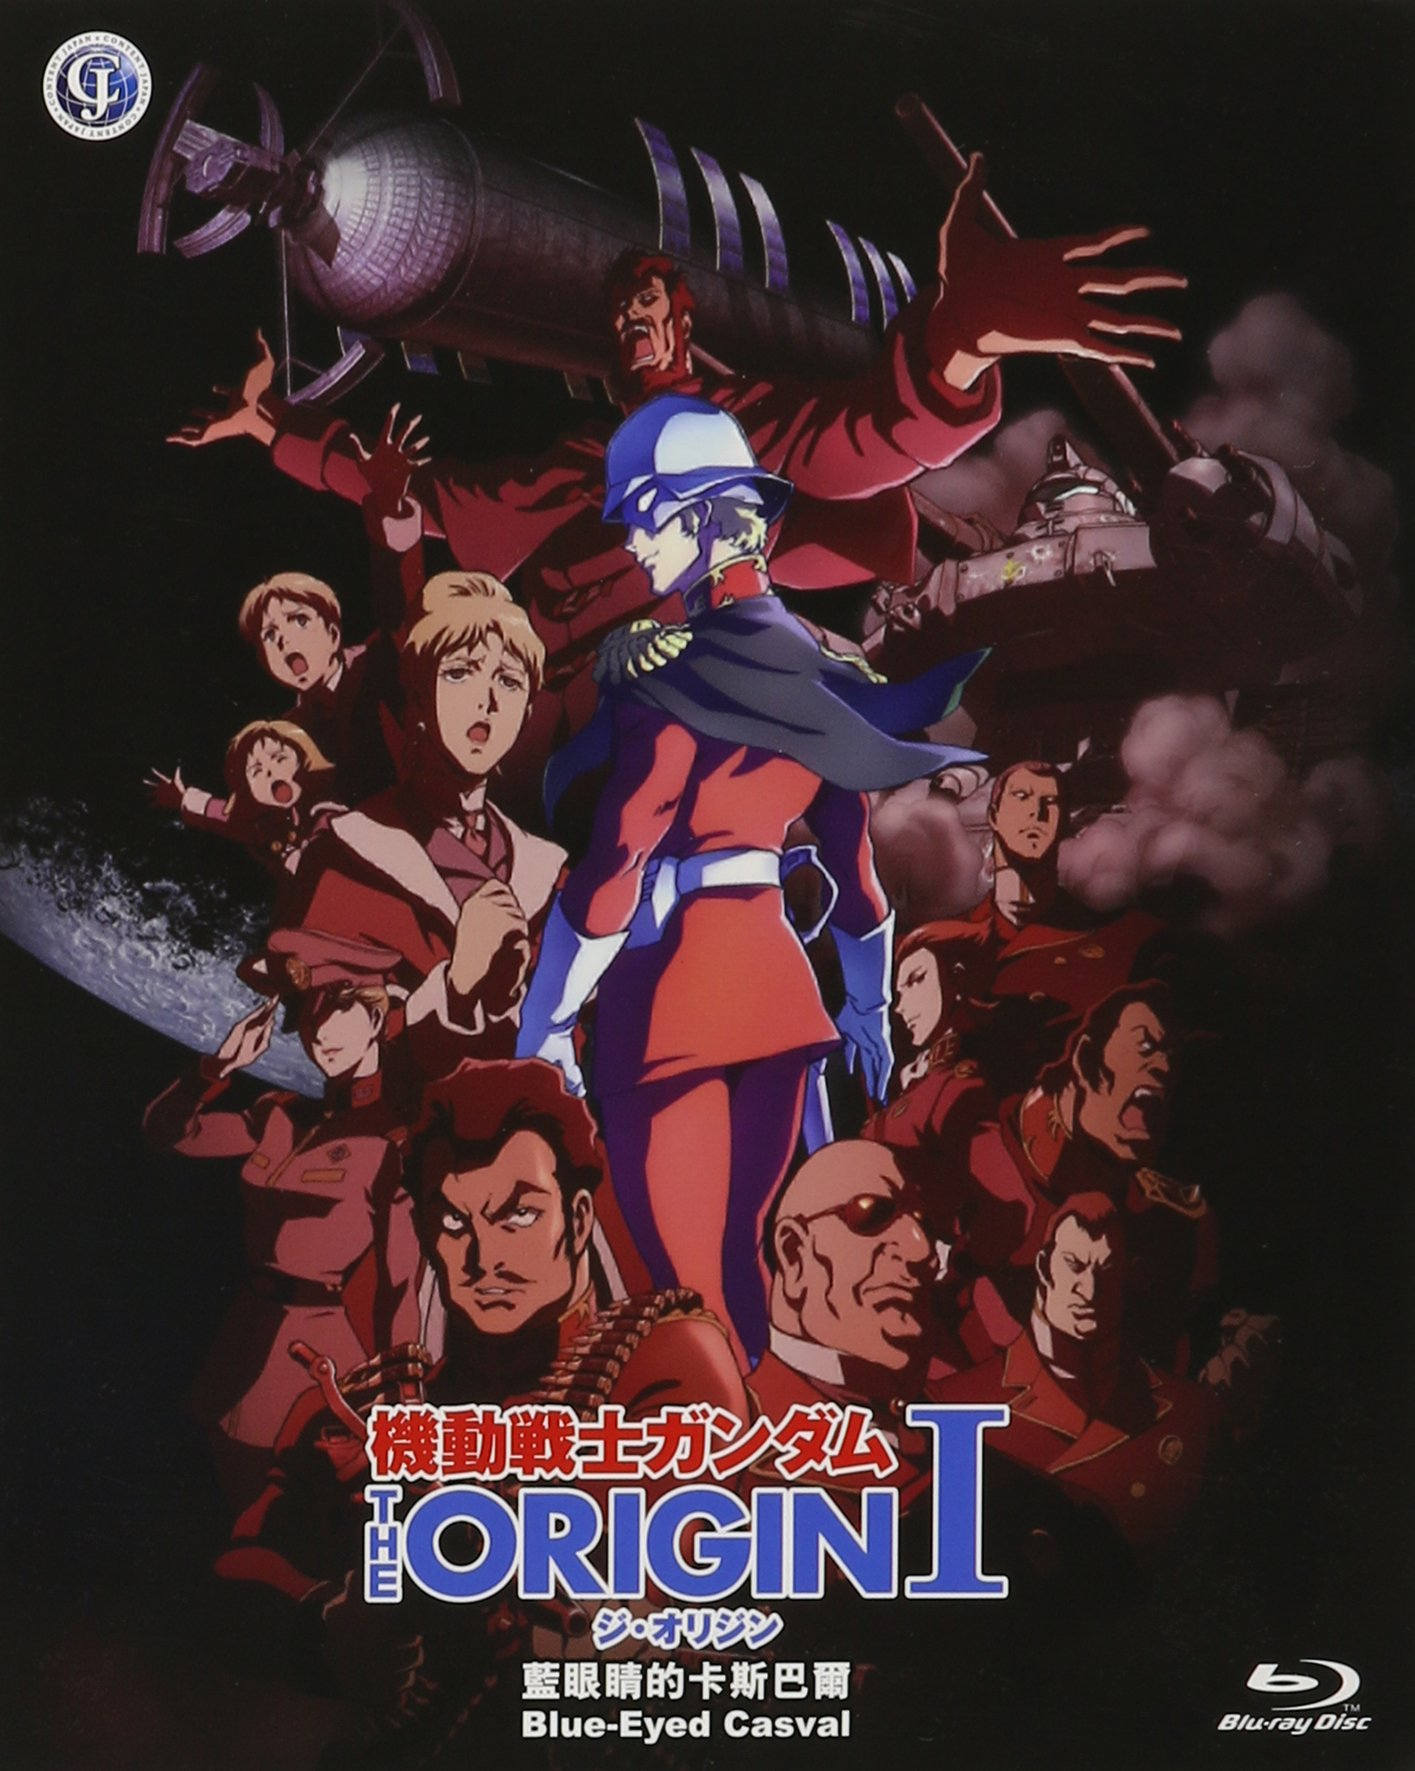 Mobile Suit Gundam: The Origin I – Blue-Eyed Casva 2015 JPN 1080p Blu-ray Remux AVC DTS-HD MA – BluDragon